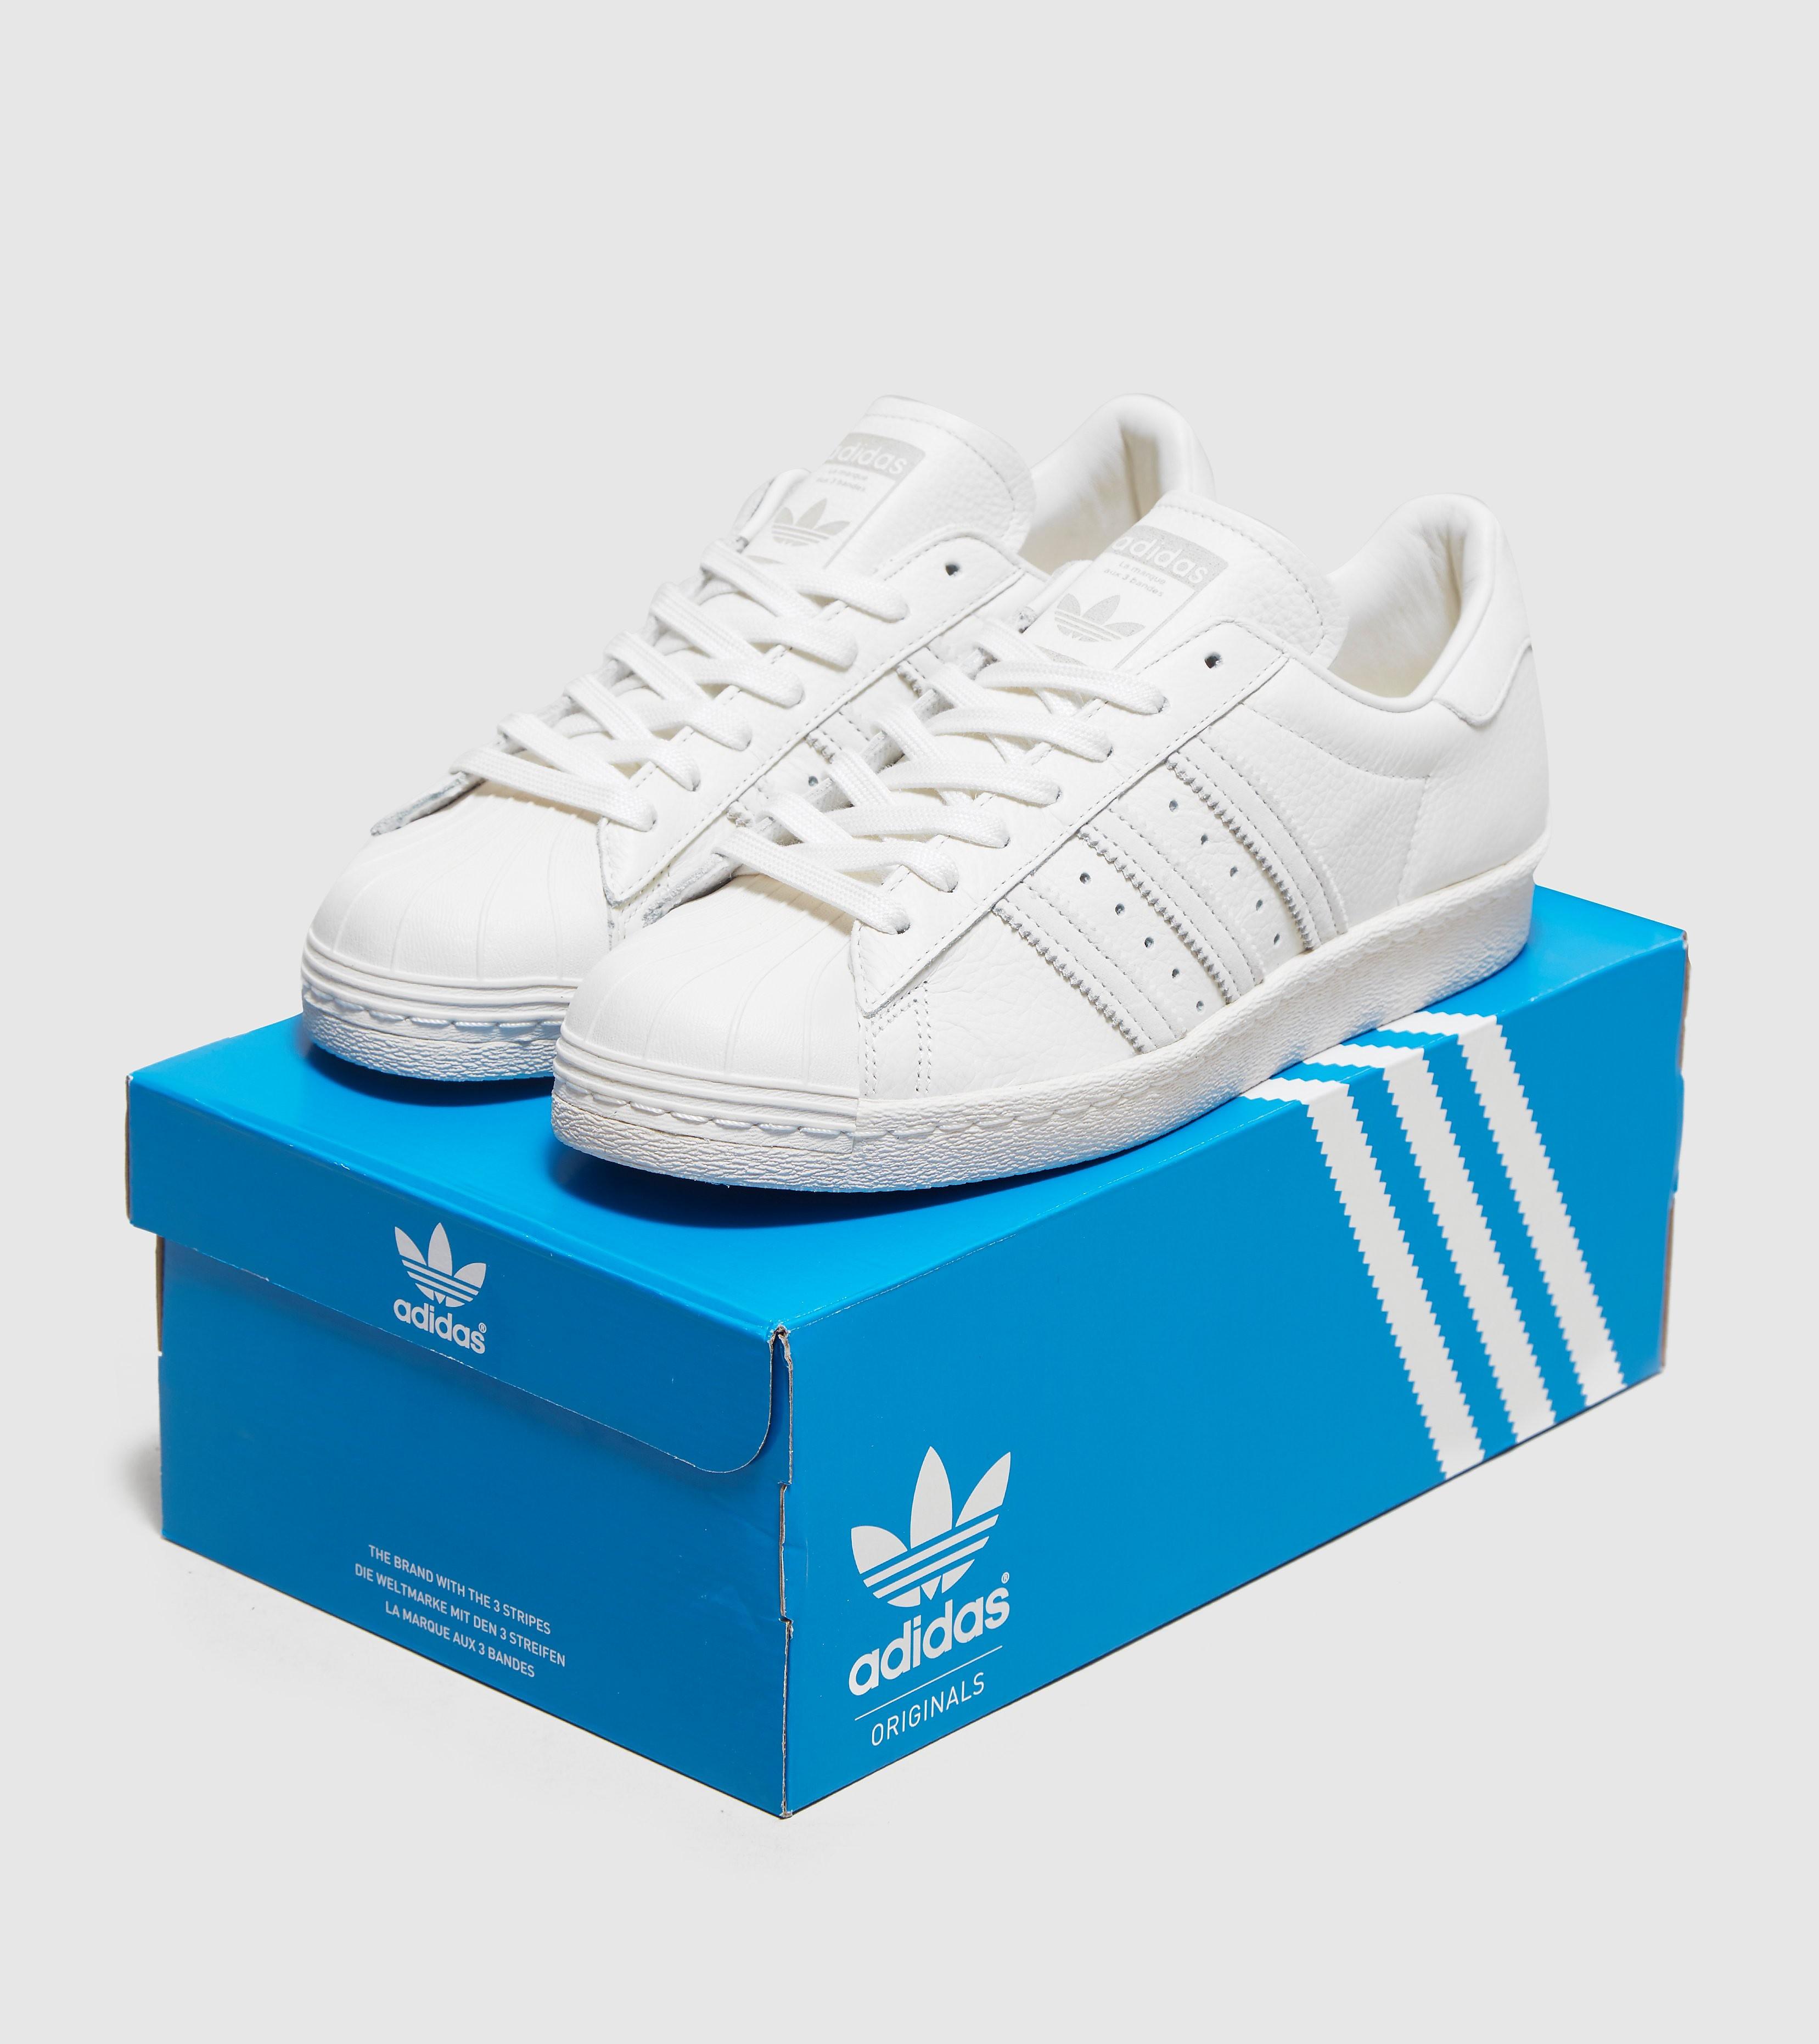 adidas Originals Superstar 80s - size? Exclusive